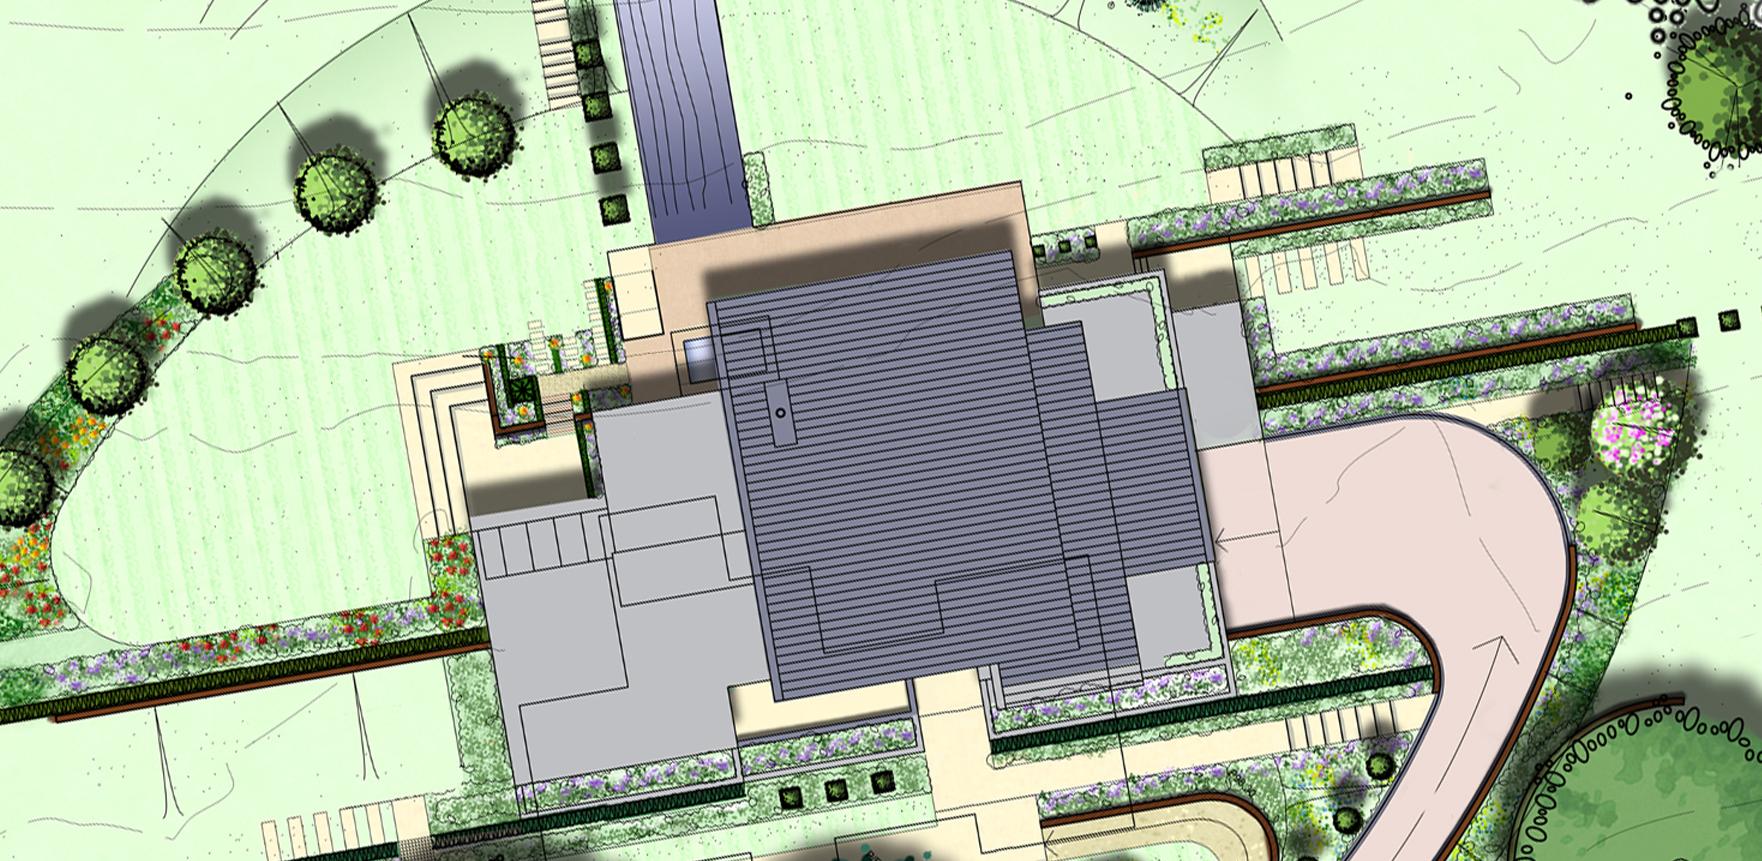 LANDSCAPE DESIGN - Residential |Commercial |Masterplanning|Urban Design |Parks & Leisure |Heritage